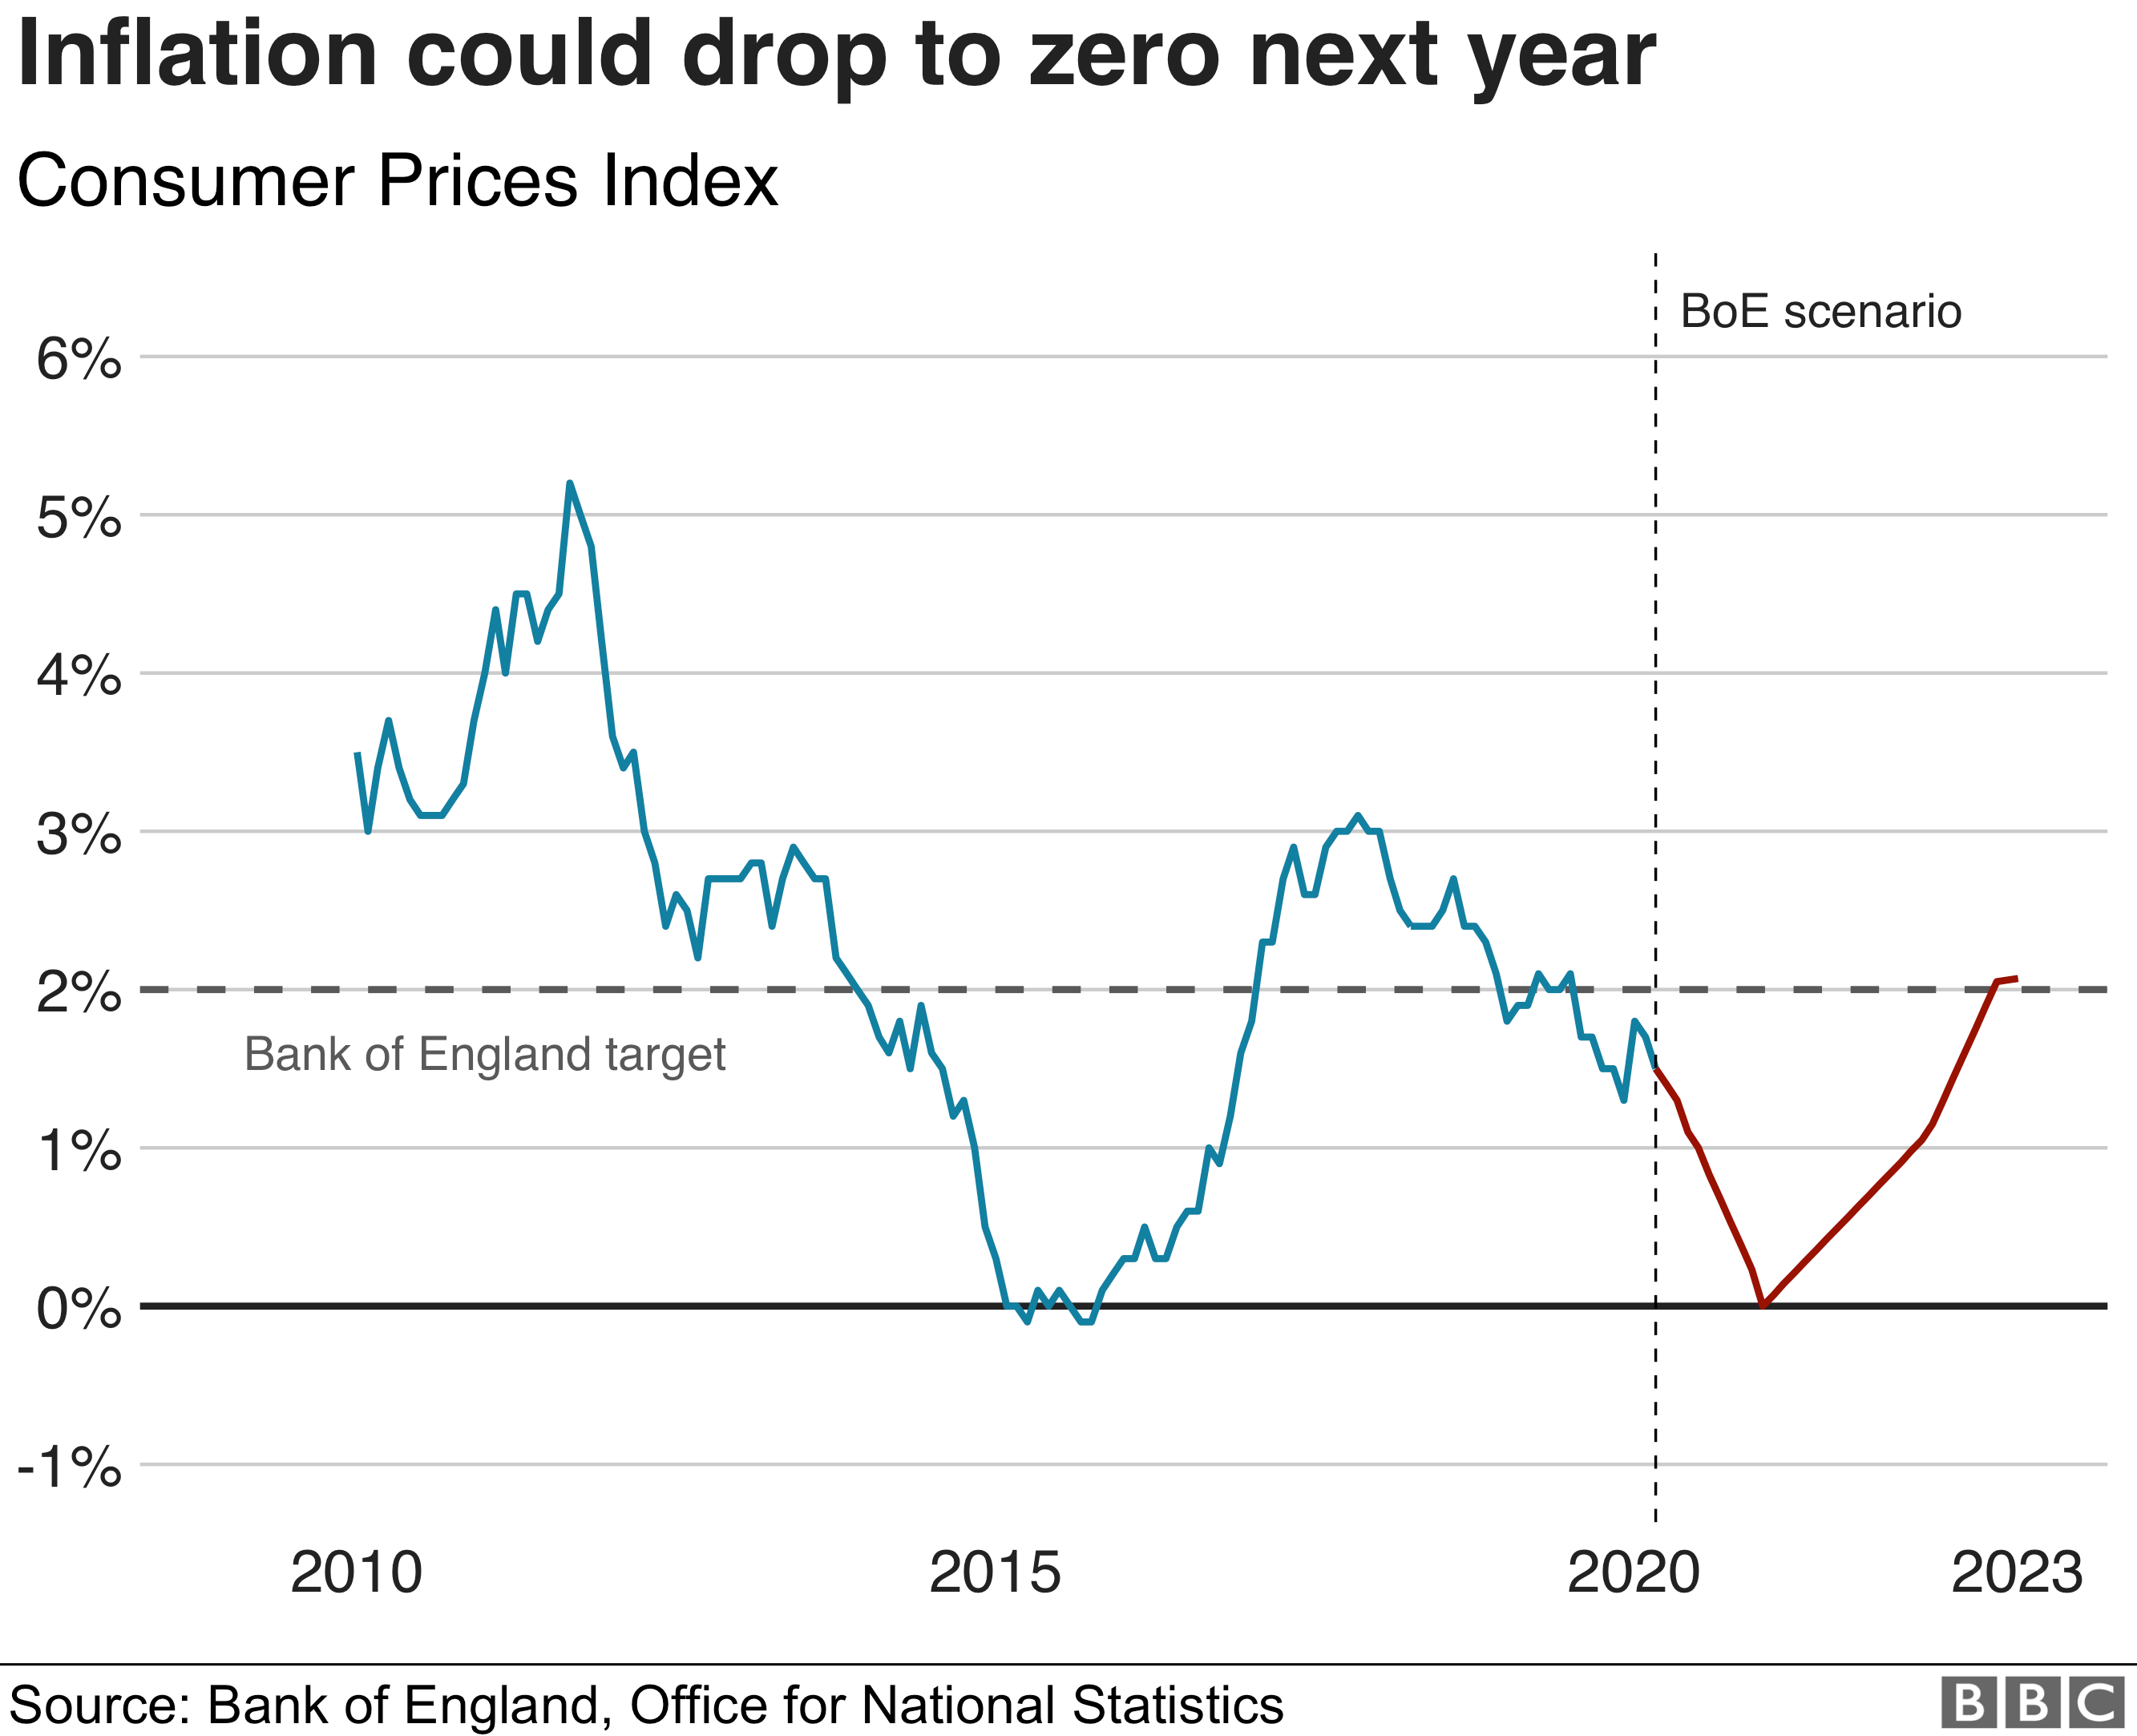 Inflation scenario